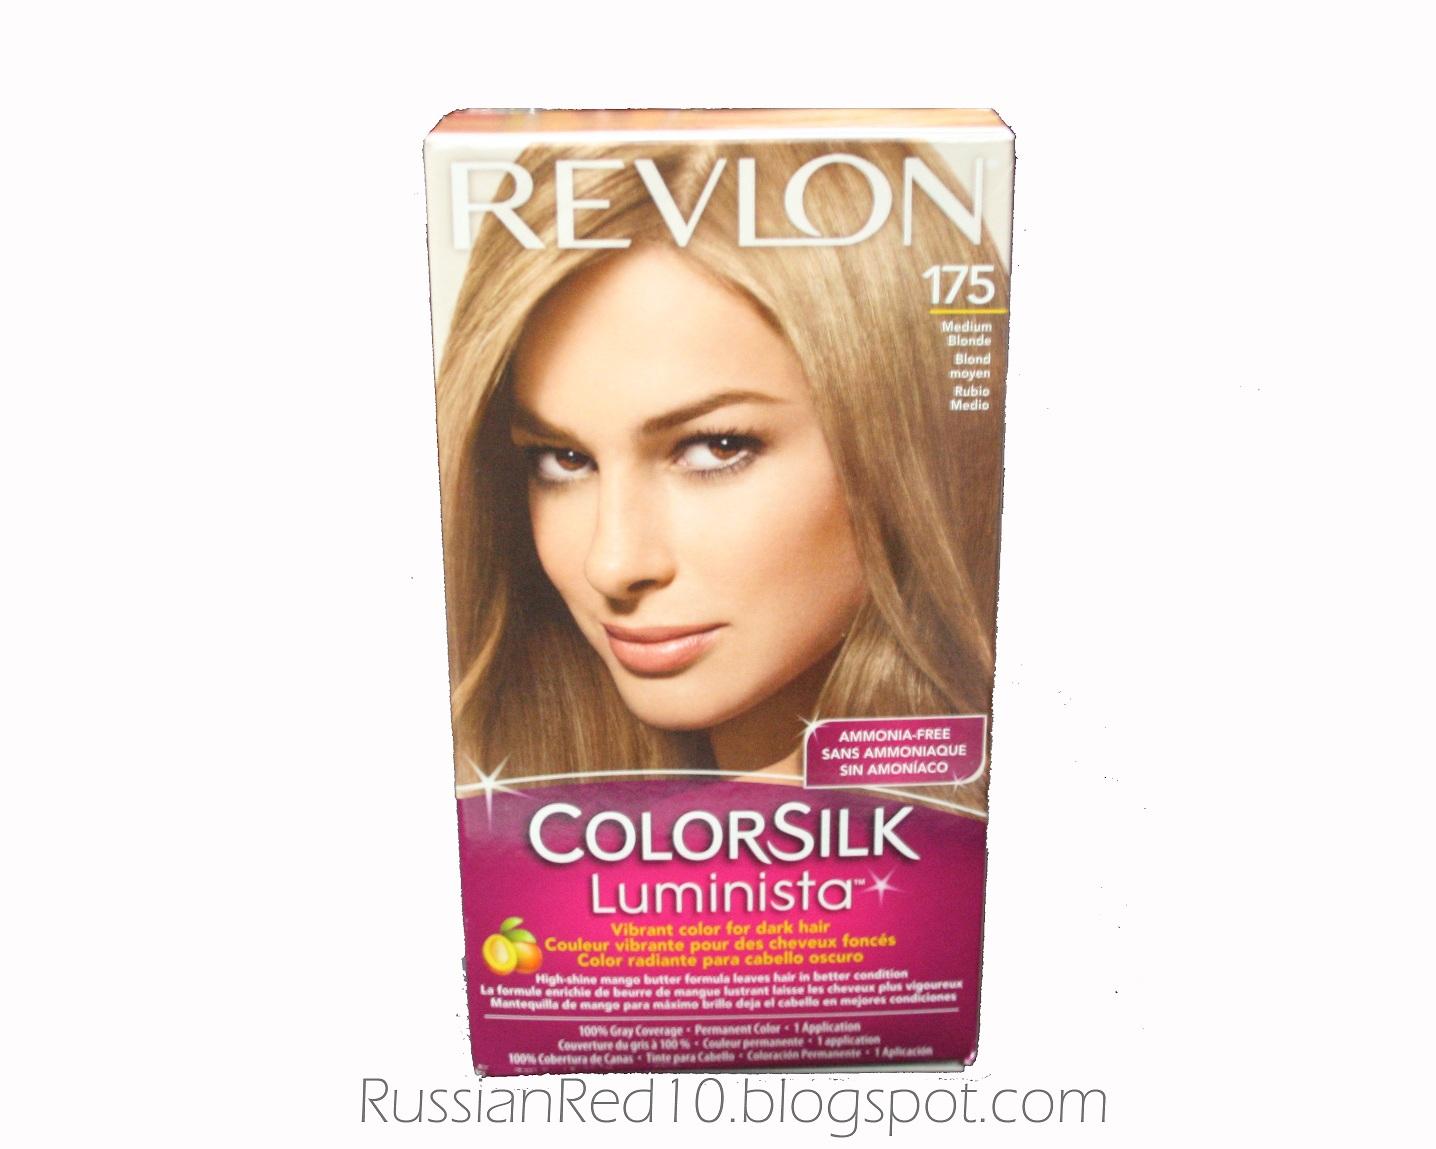 The Face Guide Review Revlon Colorsilk Luminista In 175 Medium Blonde